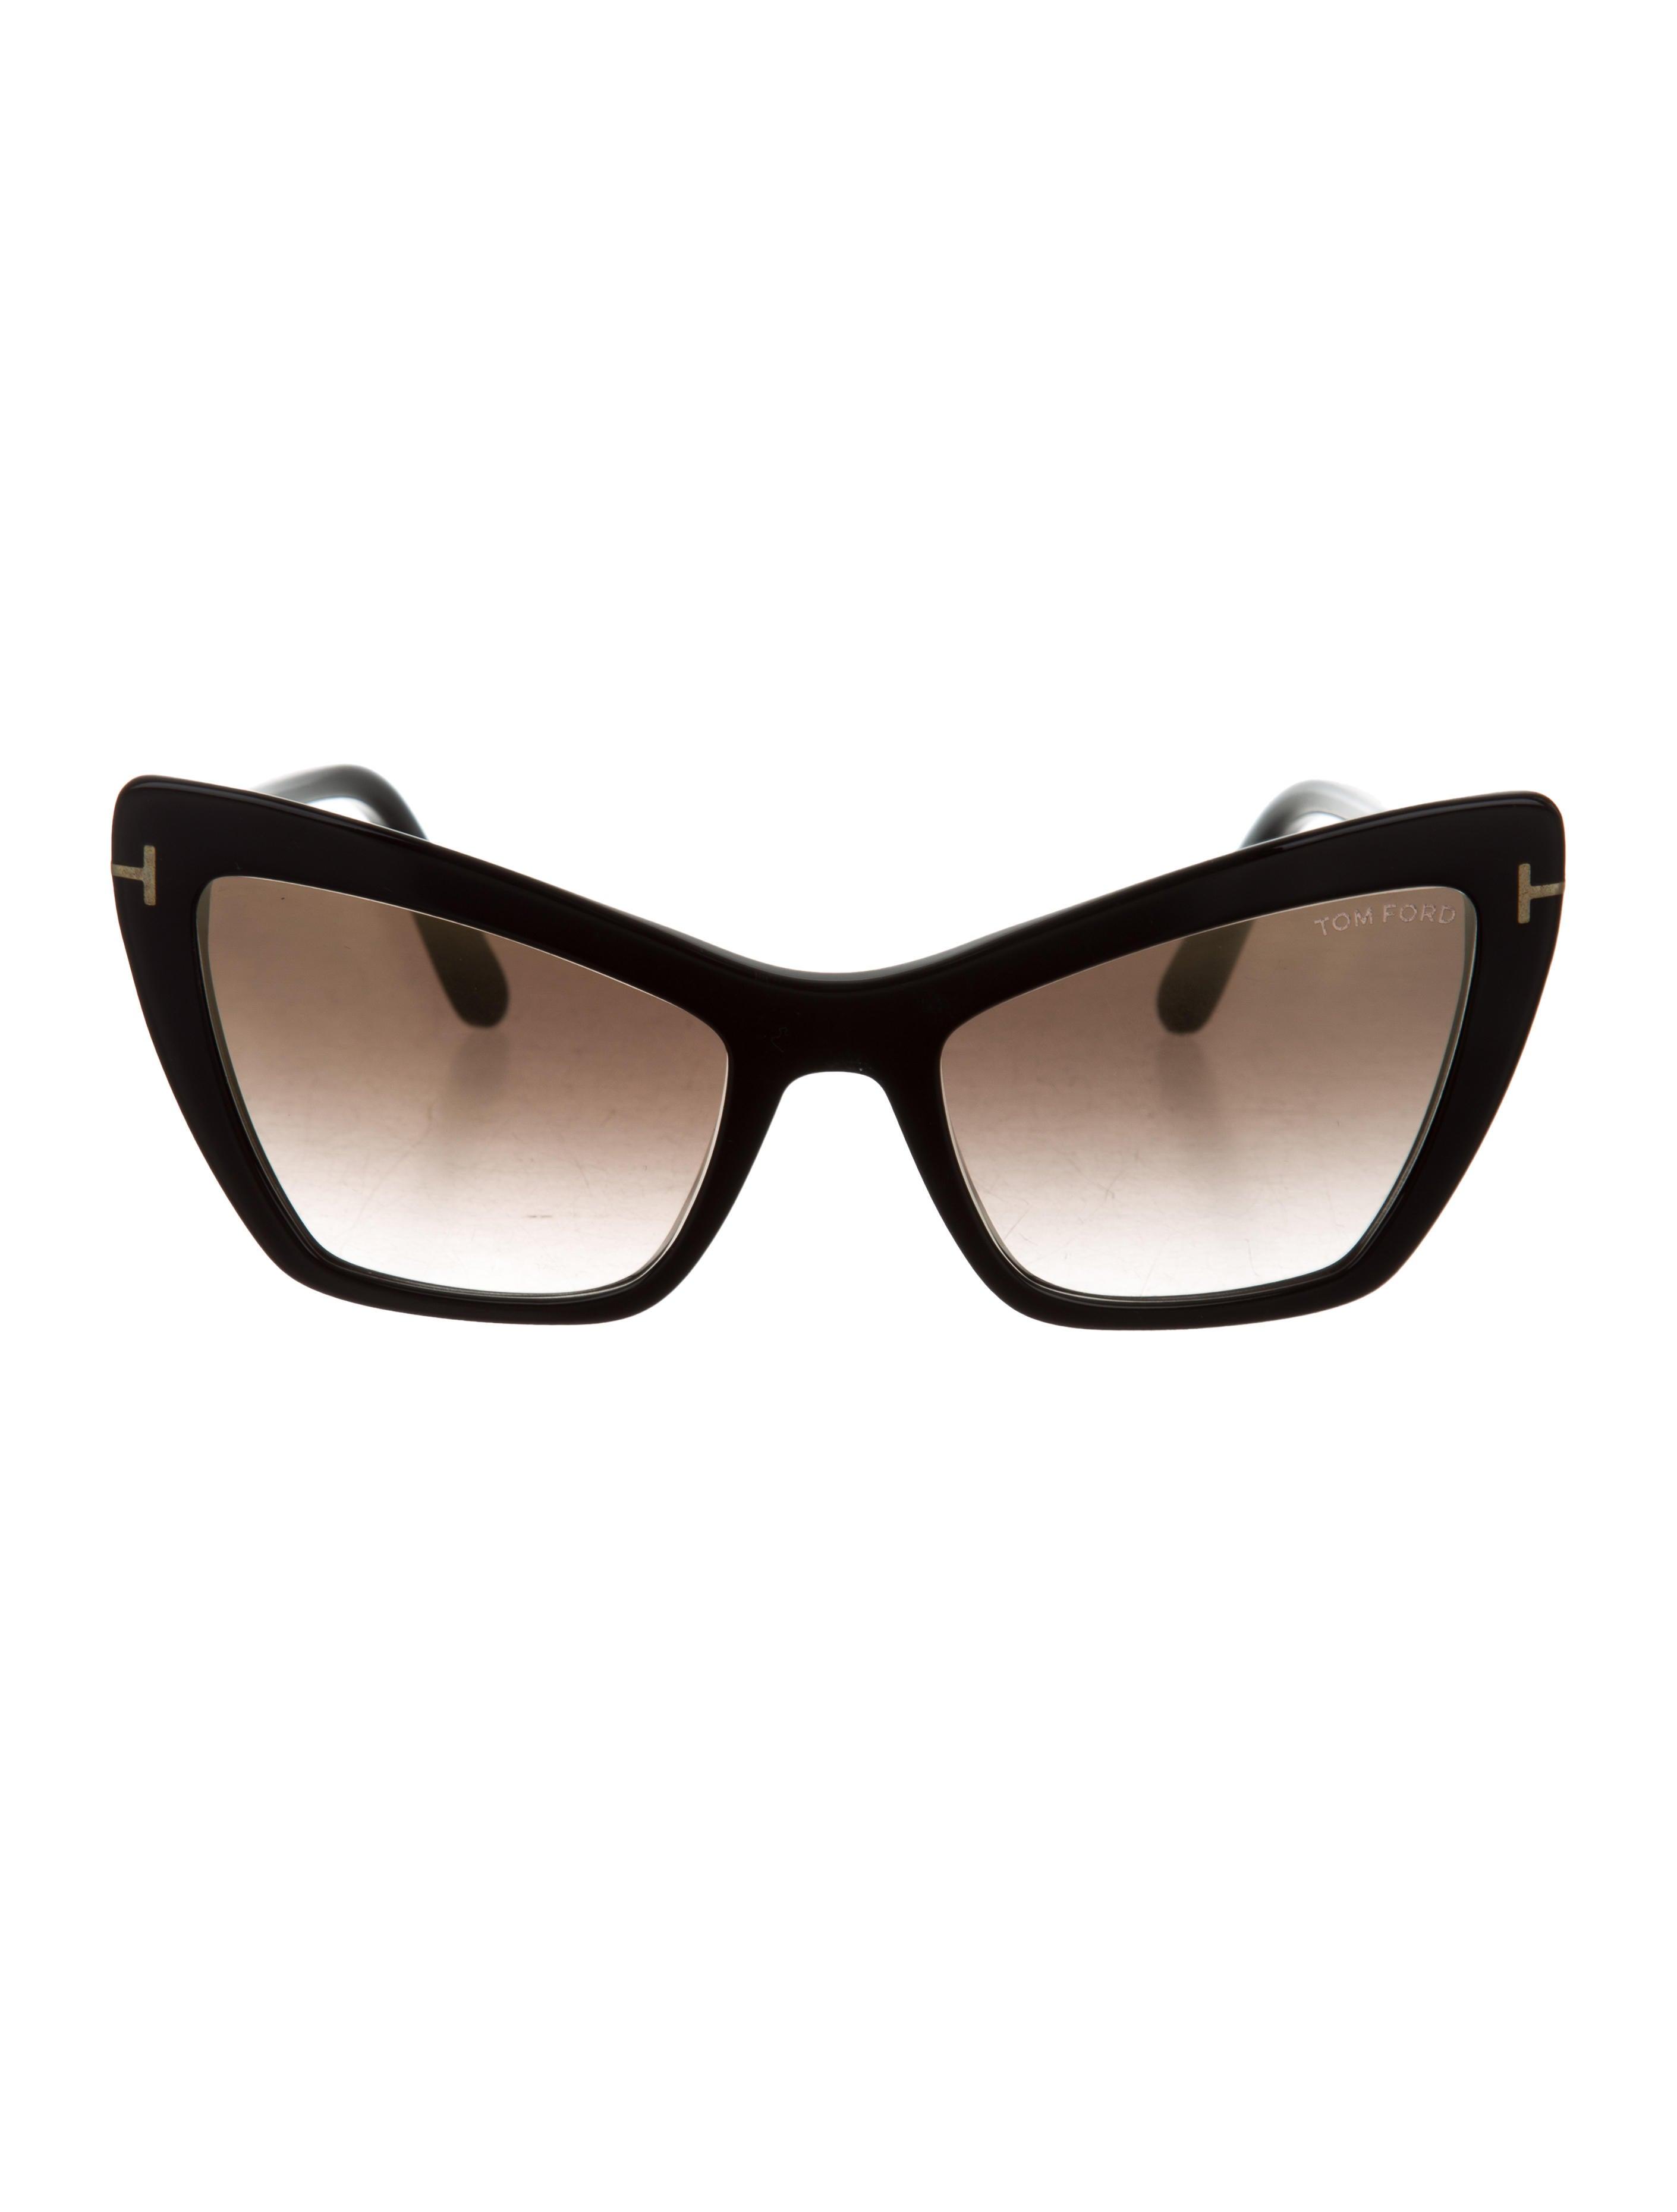 9e7943e9596b Tom Ford Valesca-02 Cat-Eye Sunglasses - Accessories - TOM36693 ...